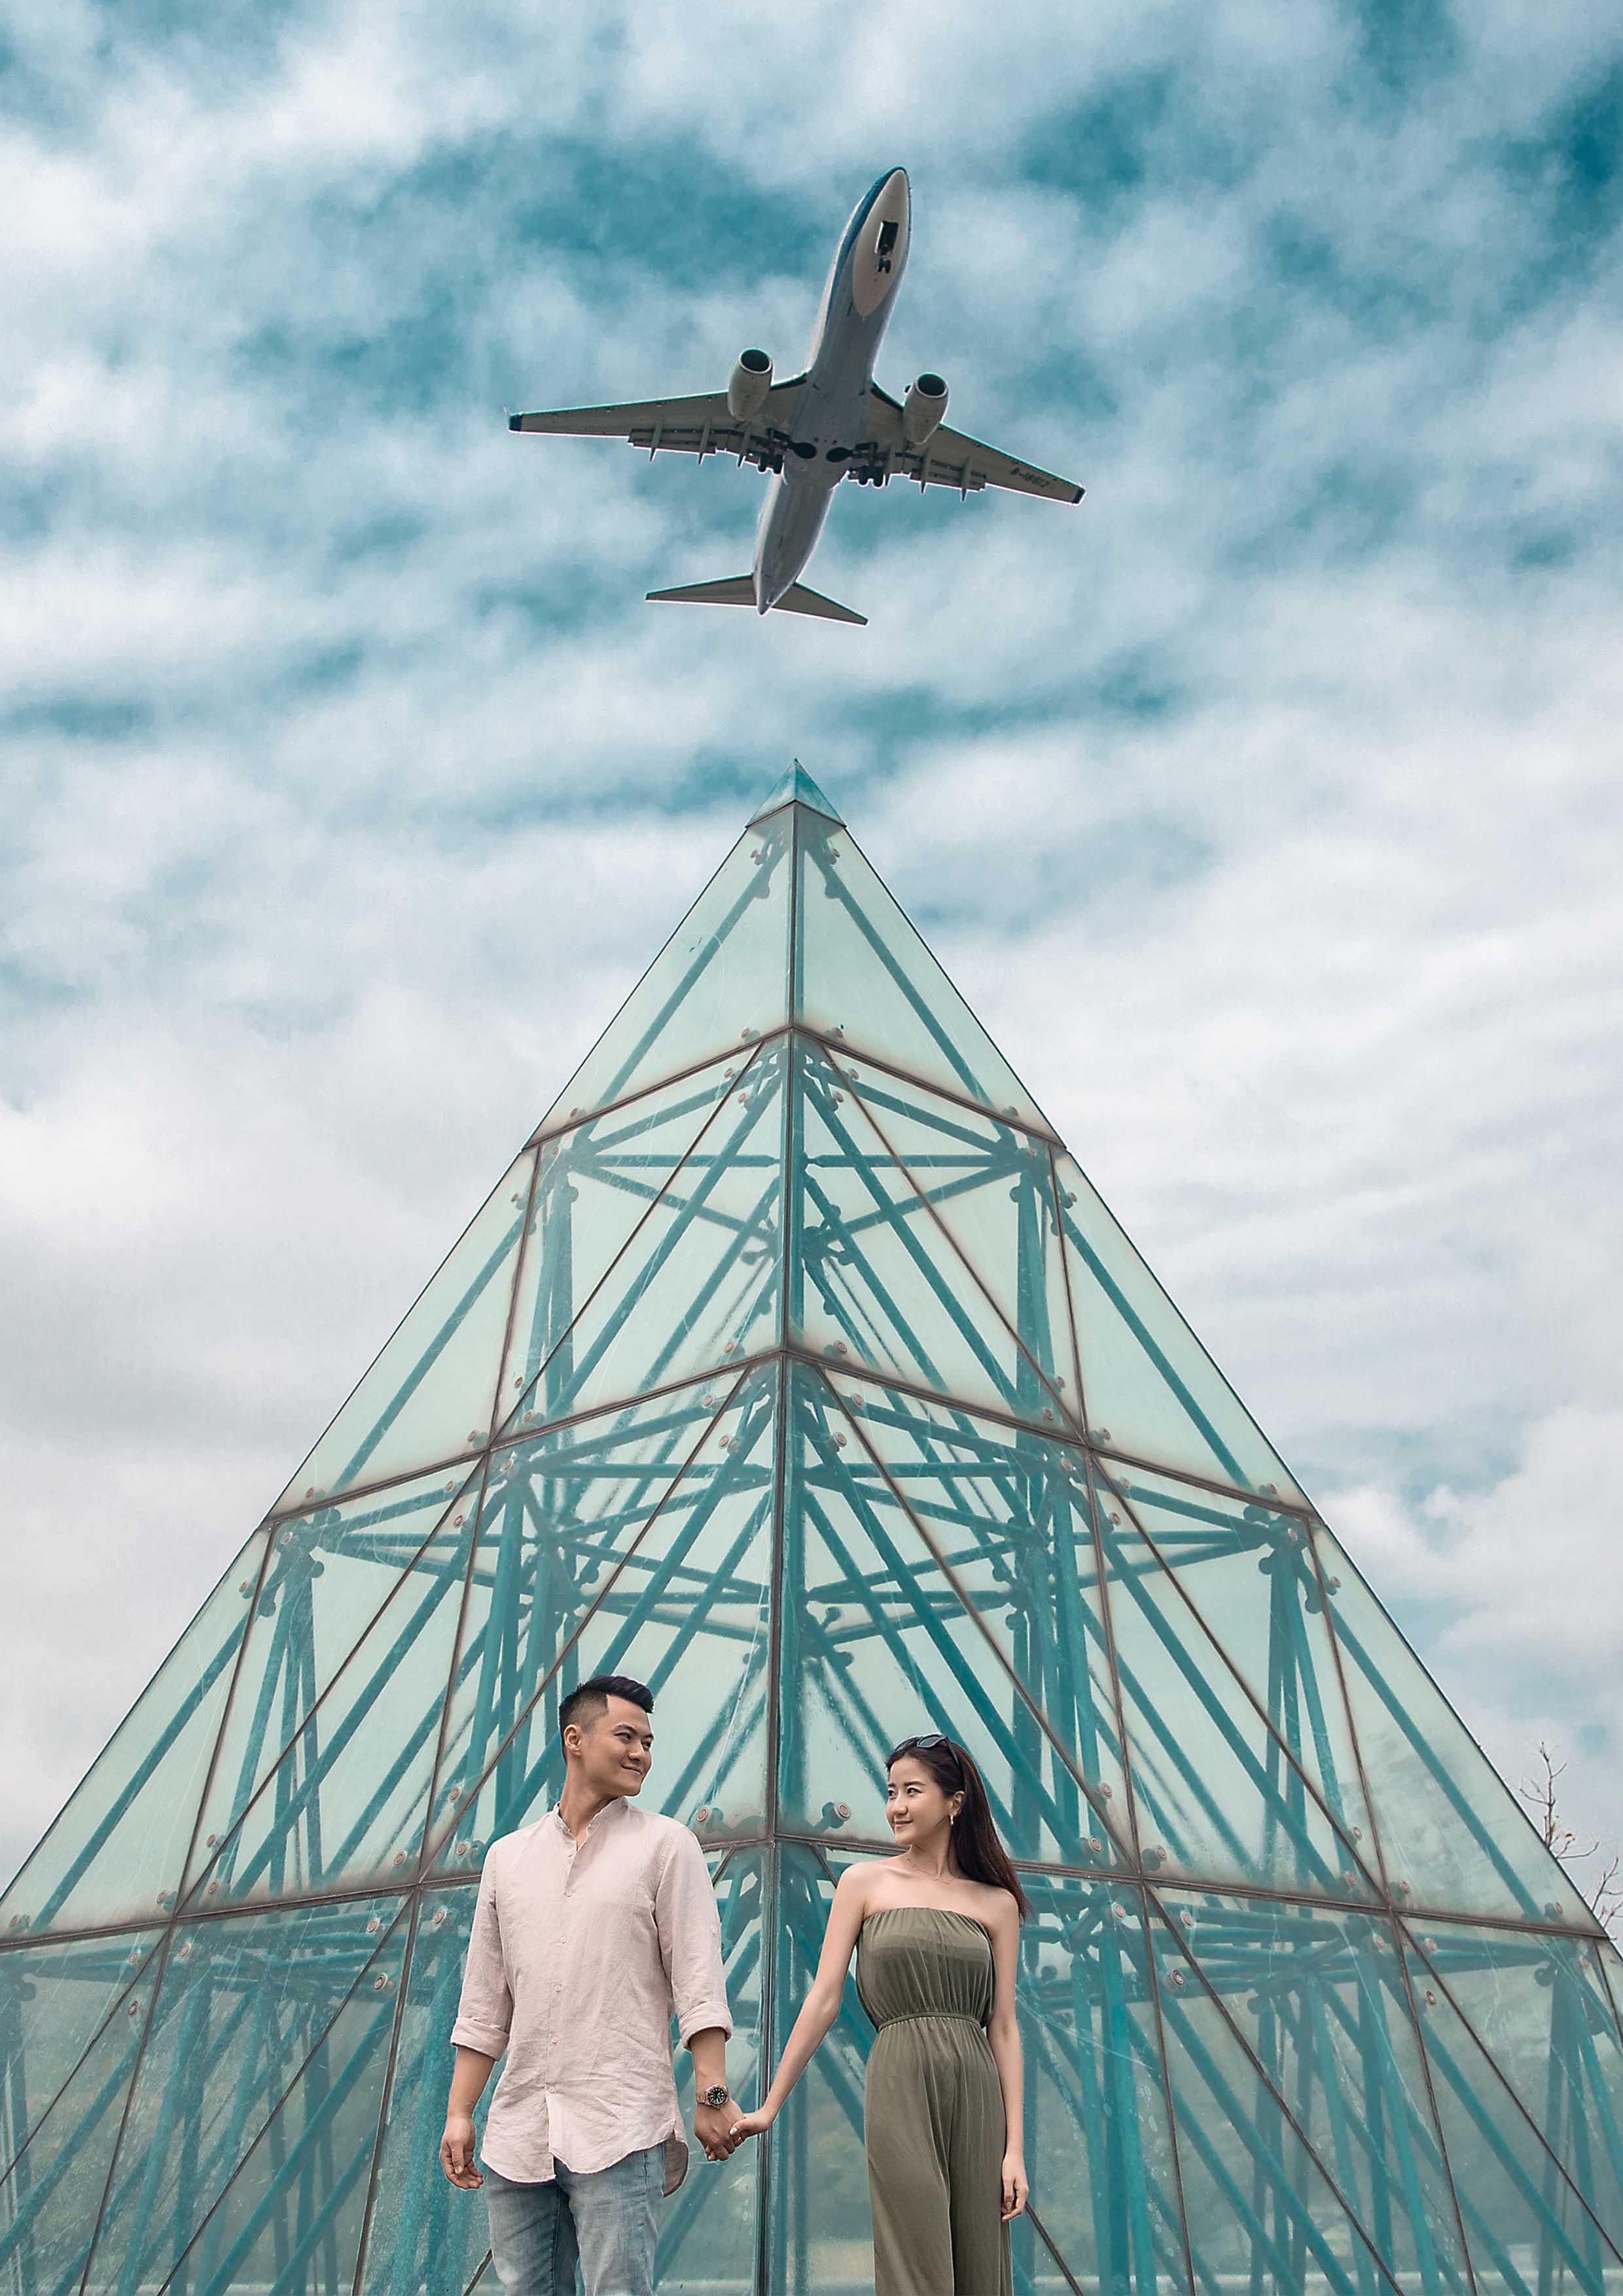 Vincent & Cherry |  台湾婚礼